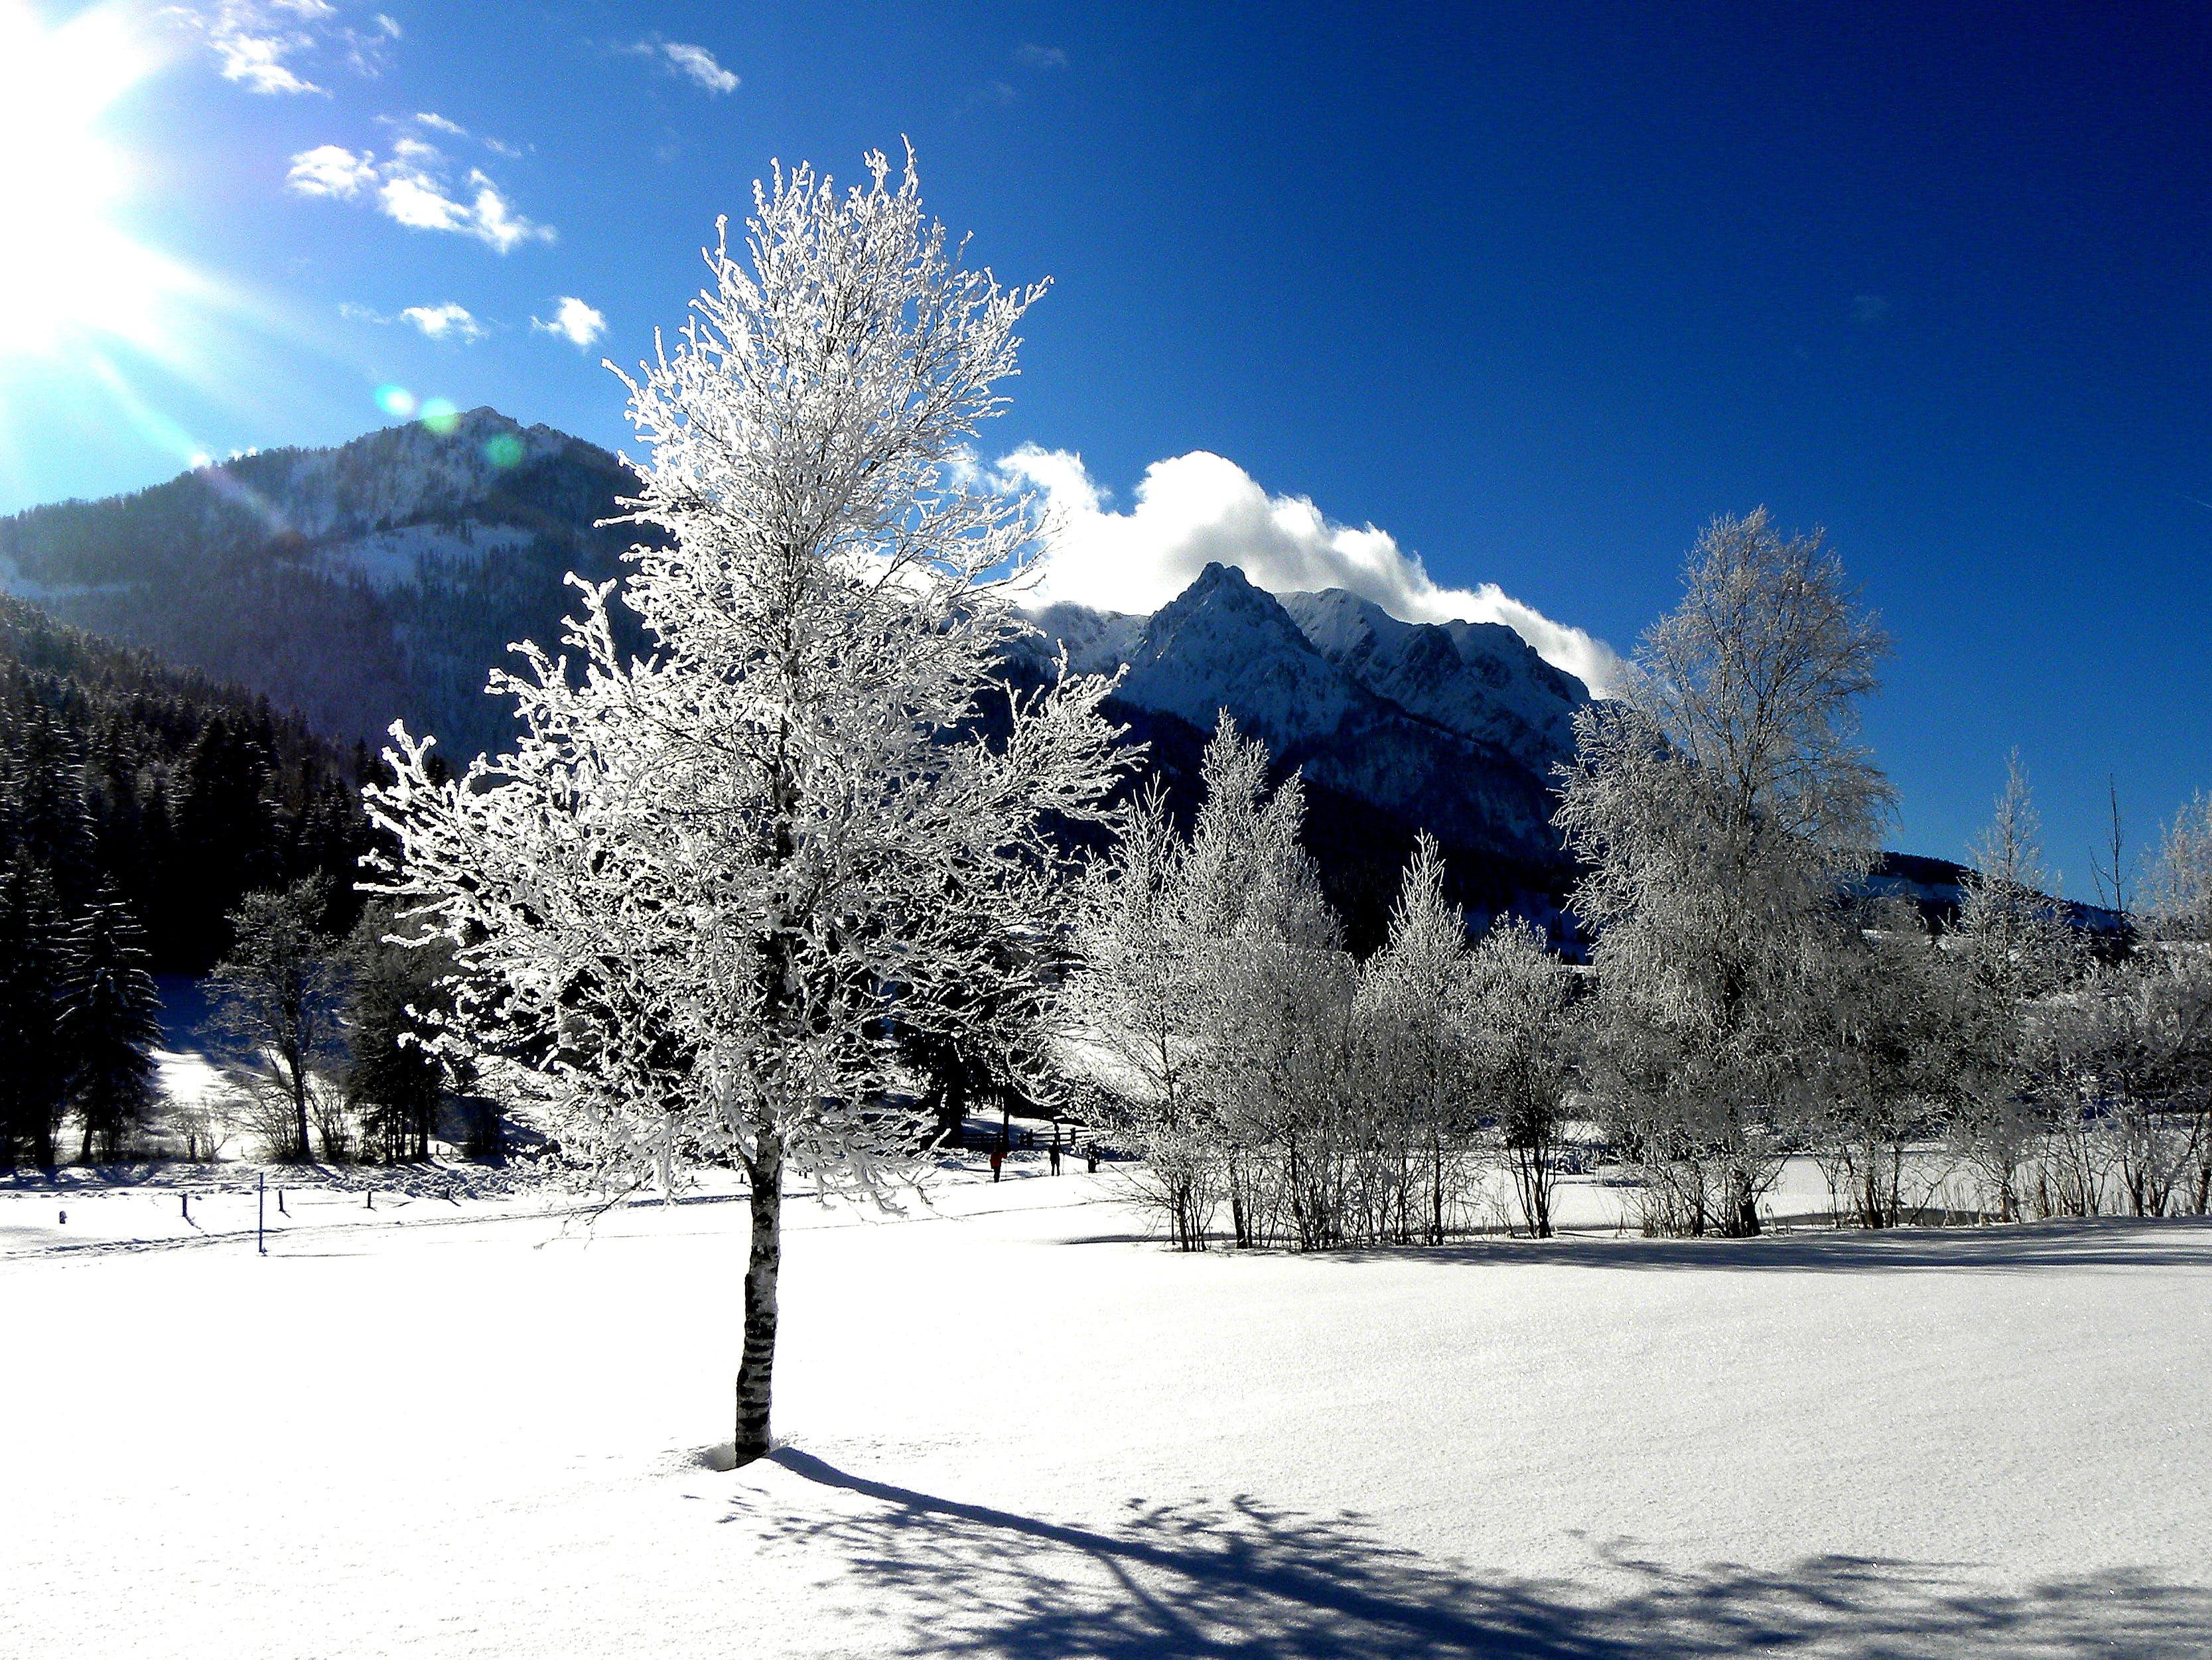 White Tree and Mountain View